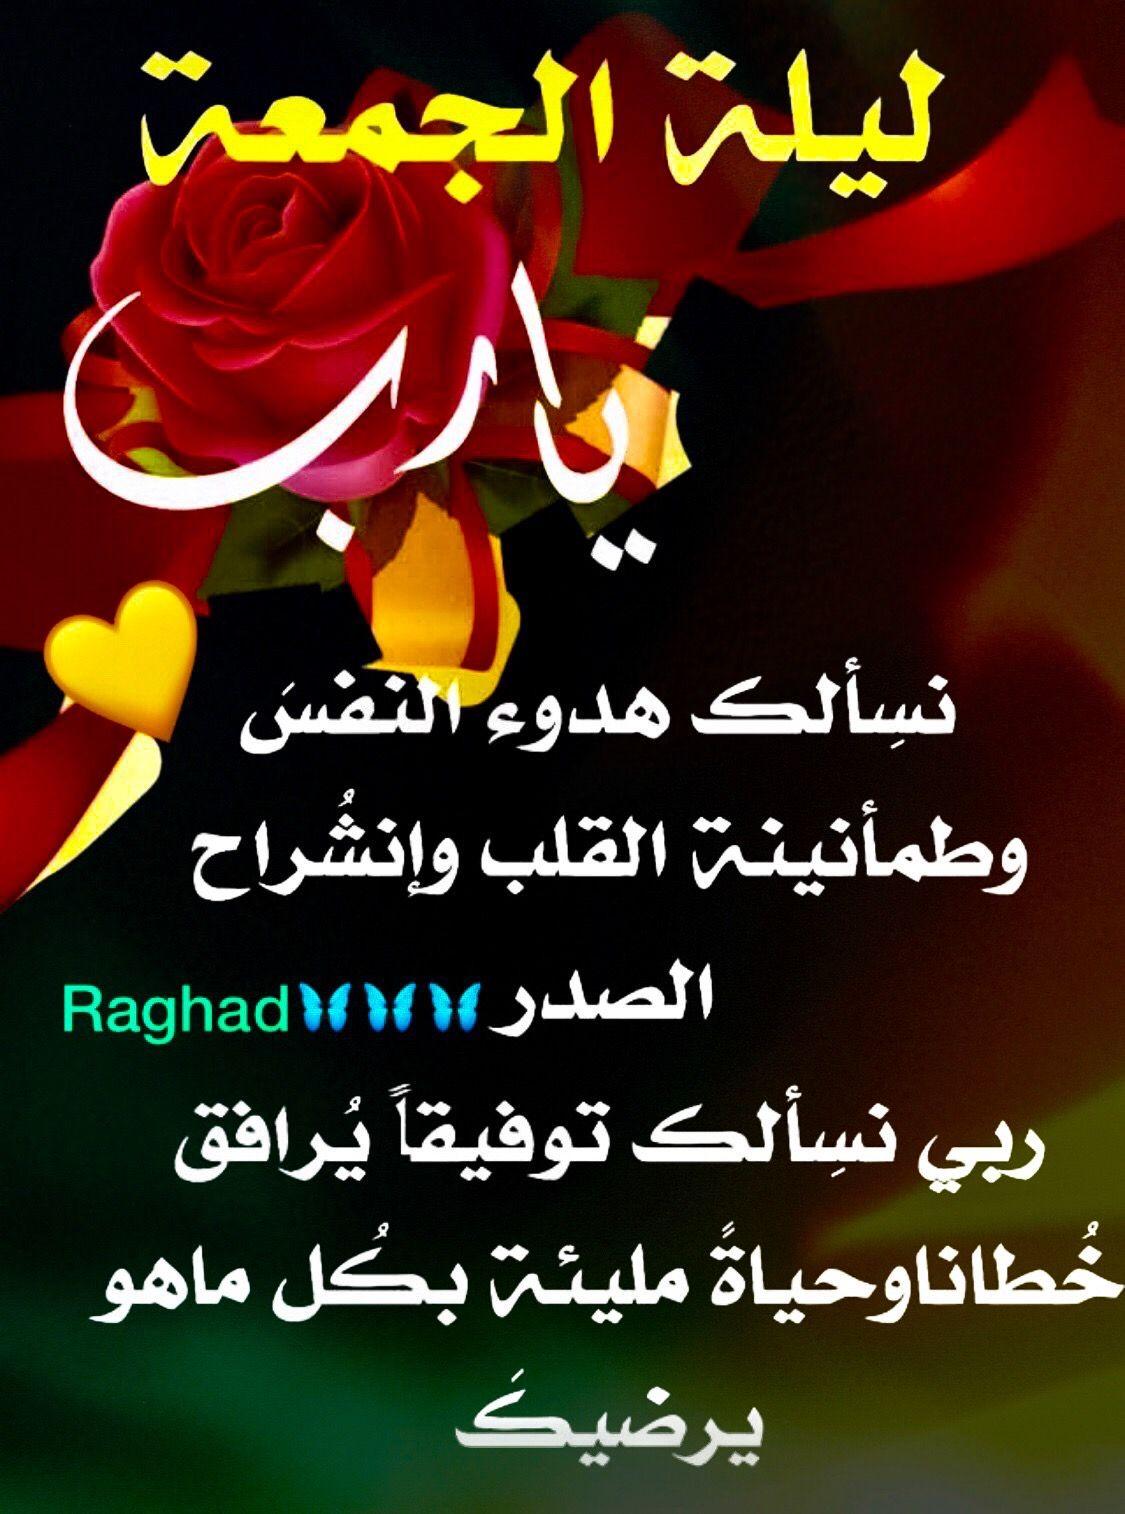 Desertrose اللهم آاااامين Beautiful Rose Flowers Beautiful Roses Rose Flower